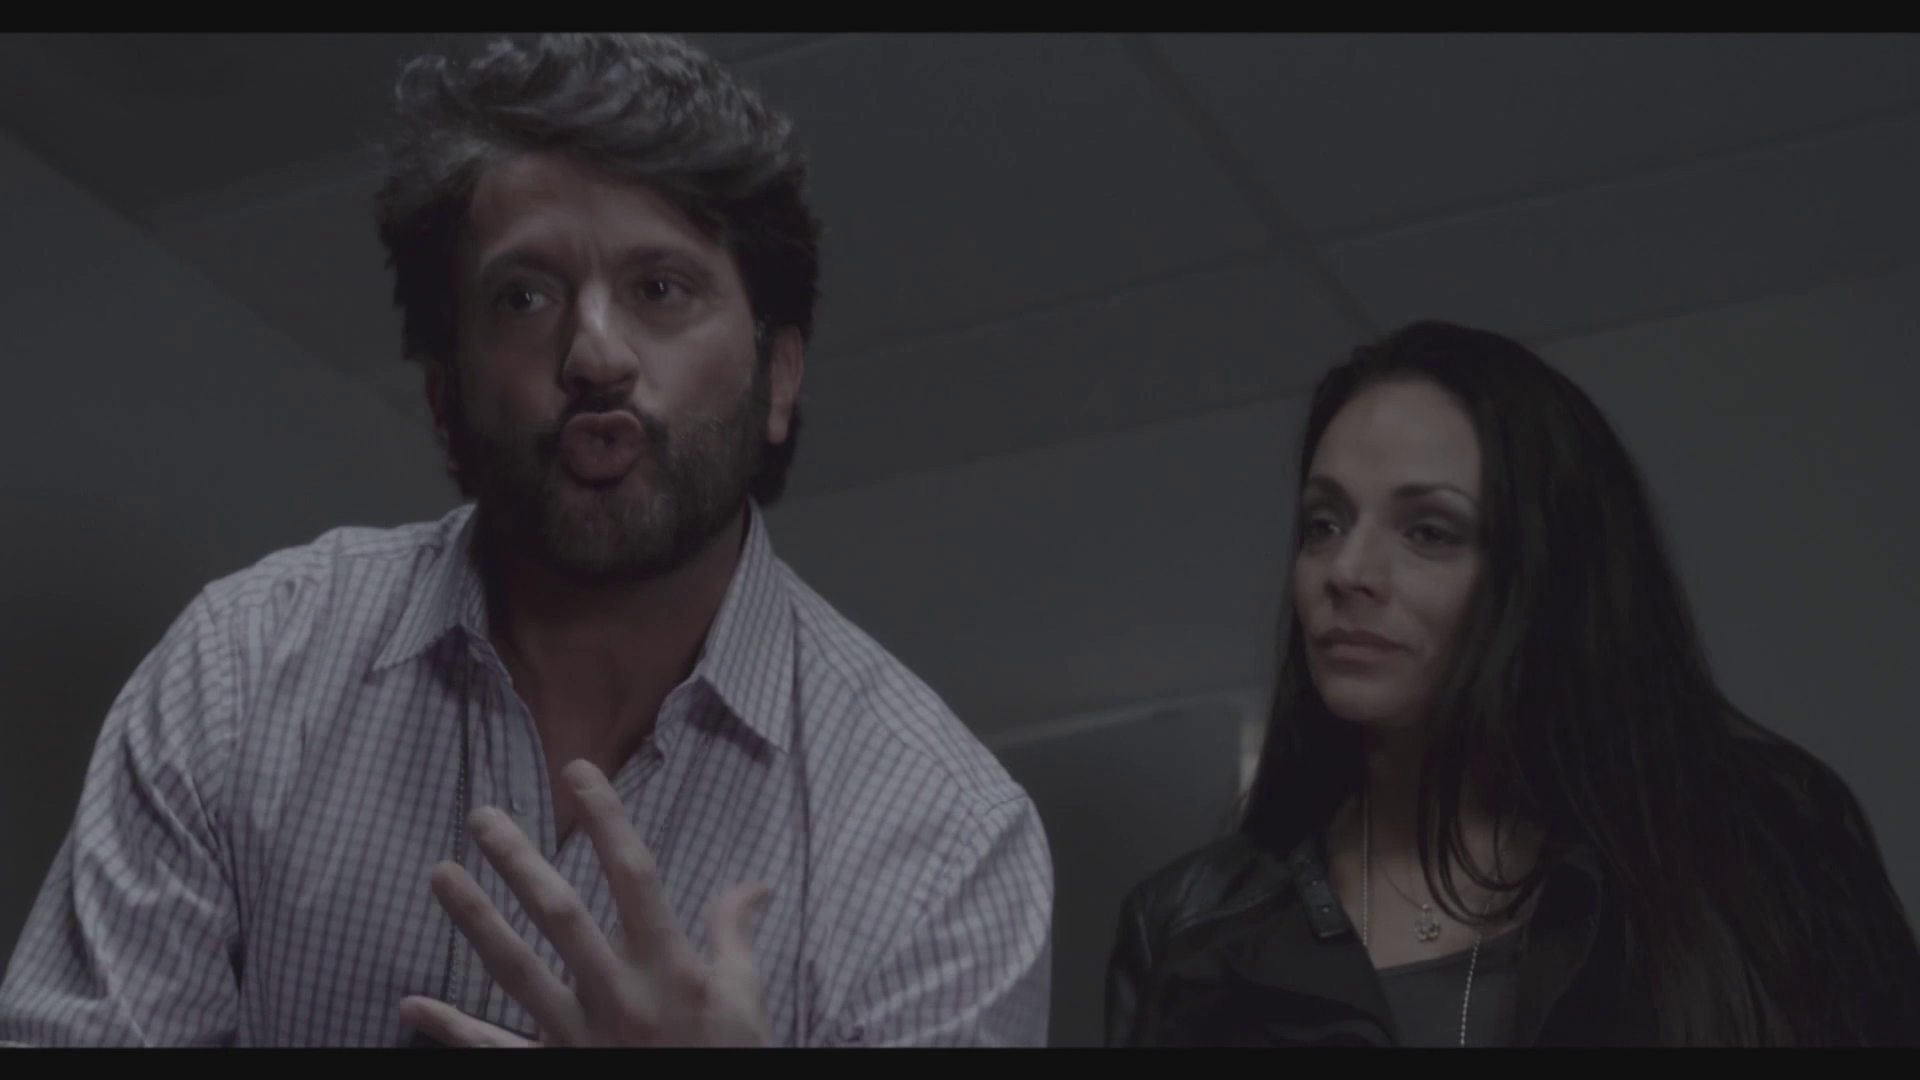 Anna Antinarcóticos (2020) 1080p WEB-DL Latino